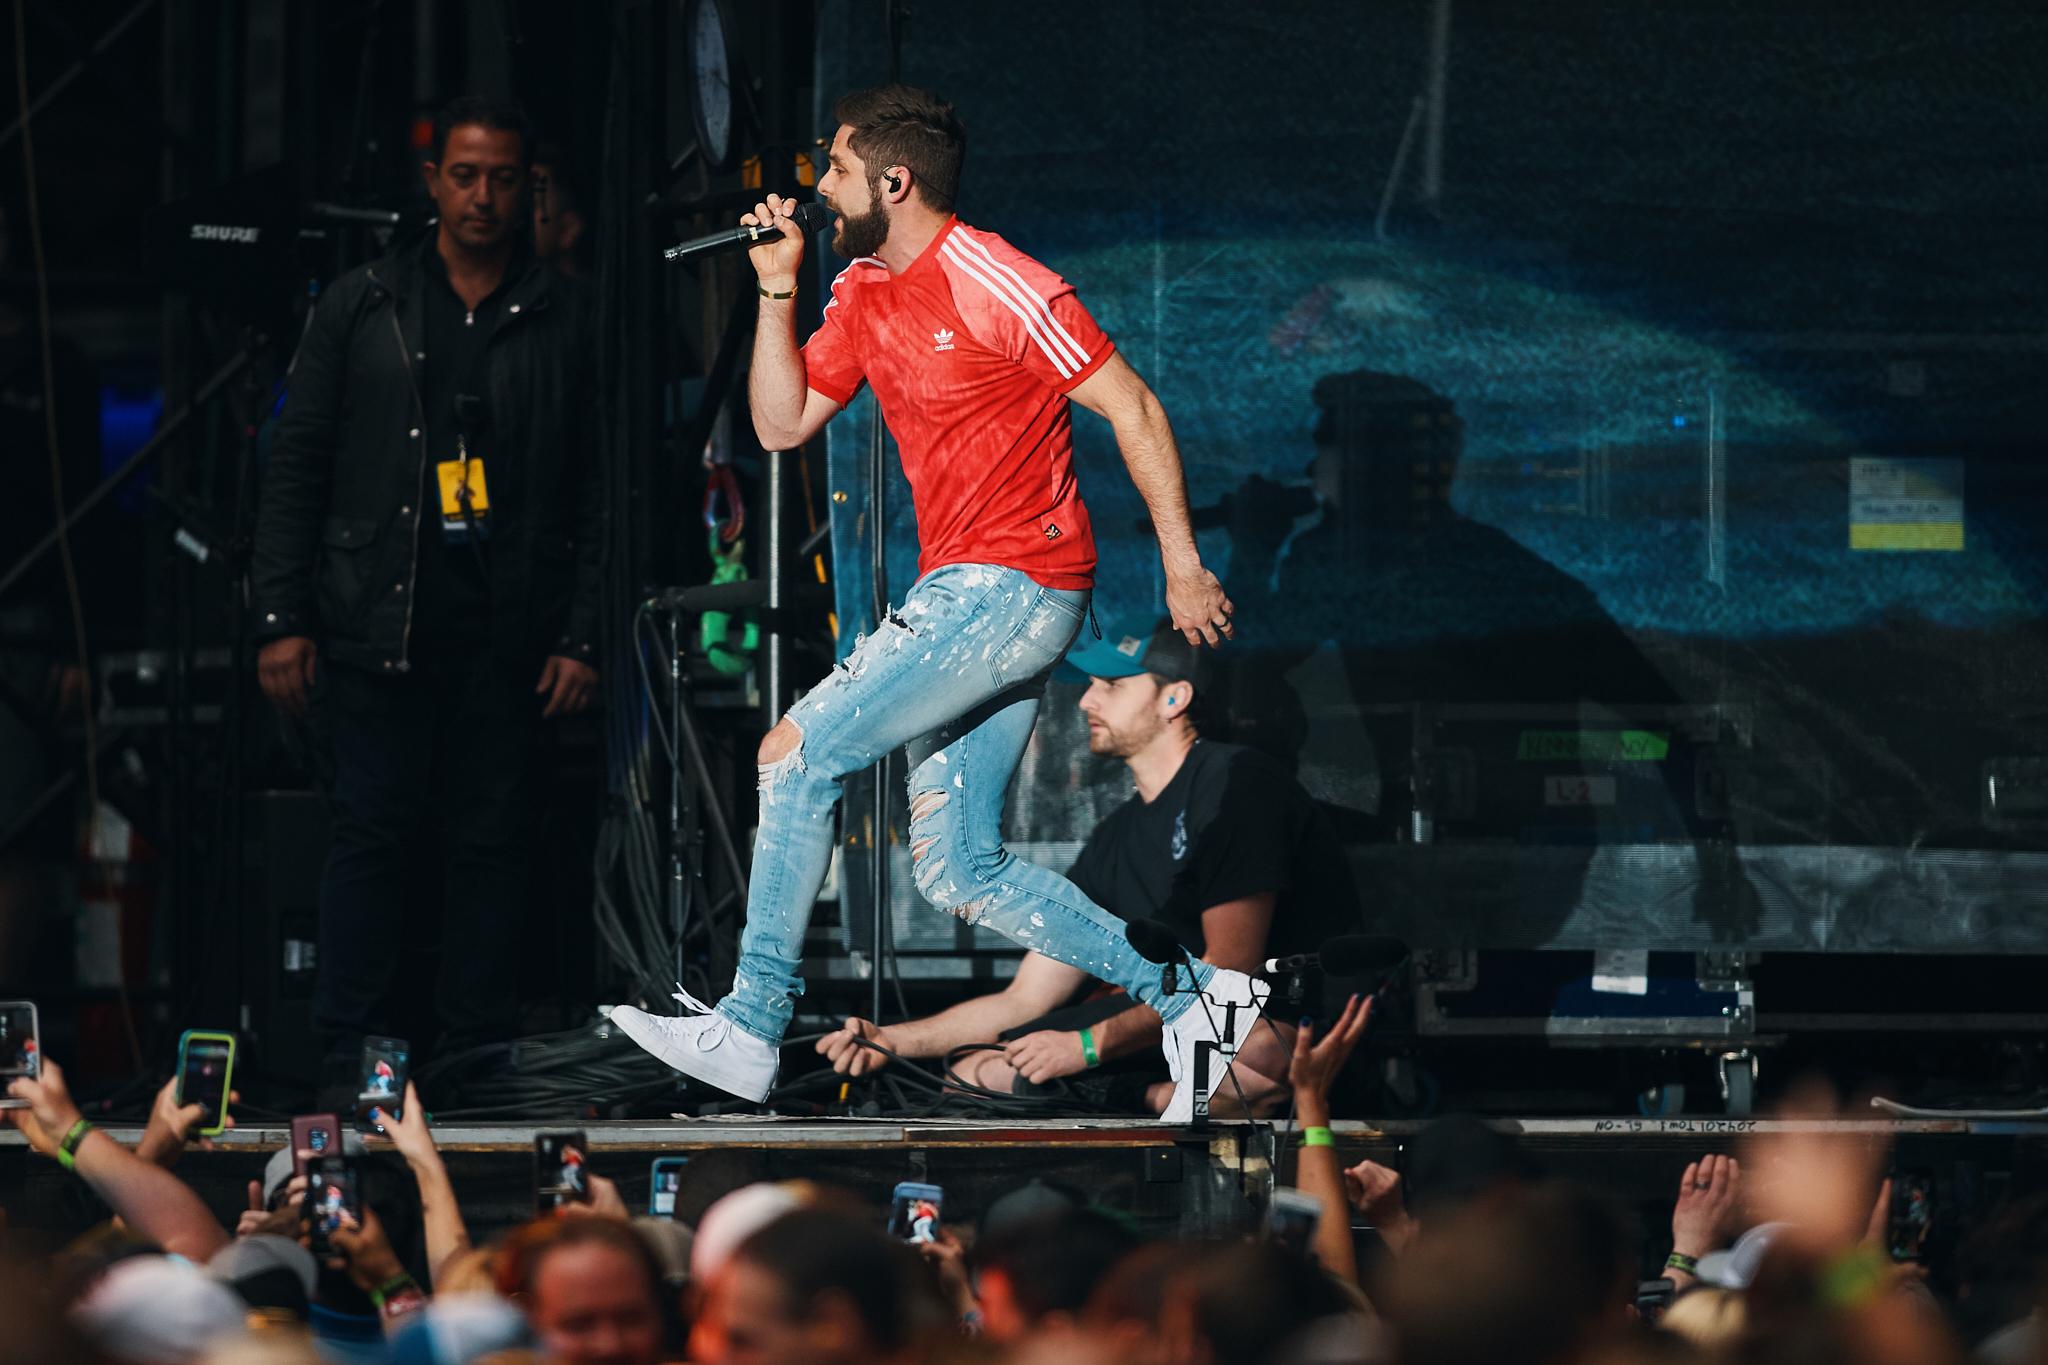 Thomas_Rhett_At_US_Bank_Stadium_On_05-05-2018_Photo_By_Joe_Lemke_001.jpg